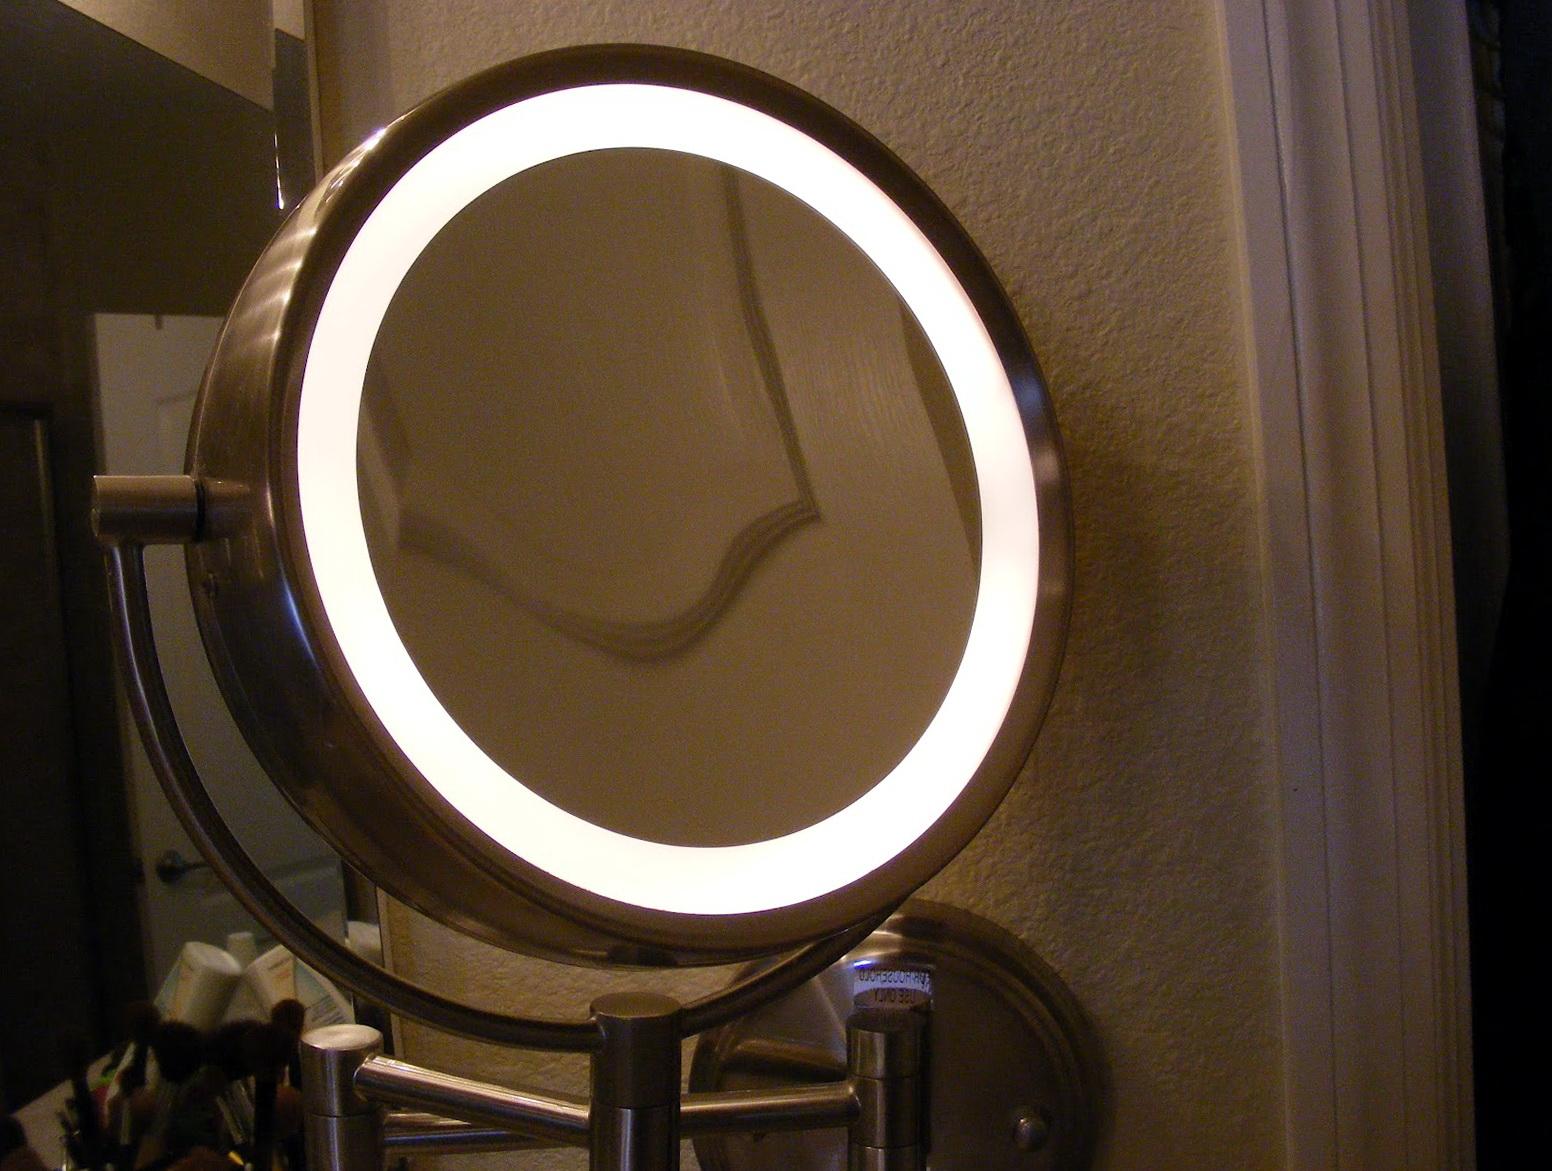 Light Up Makeup Mirror Amazon Home Design Ideas